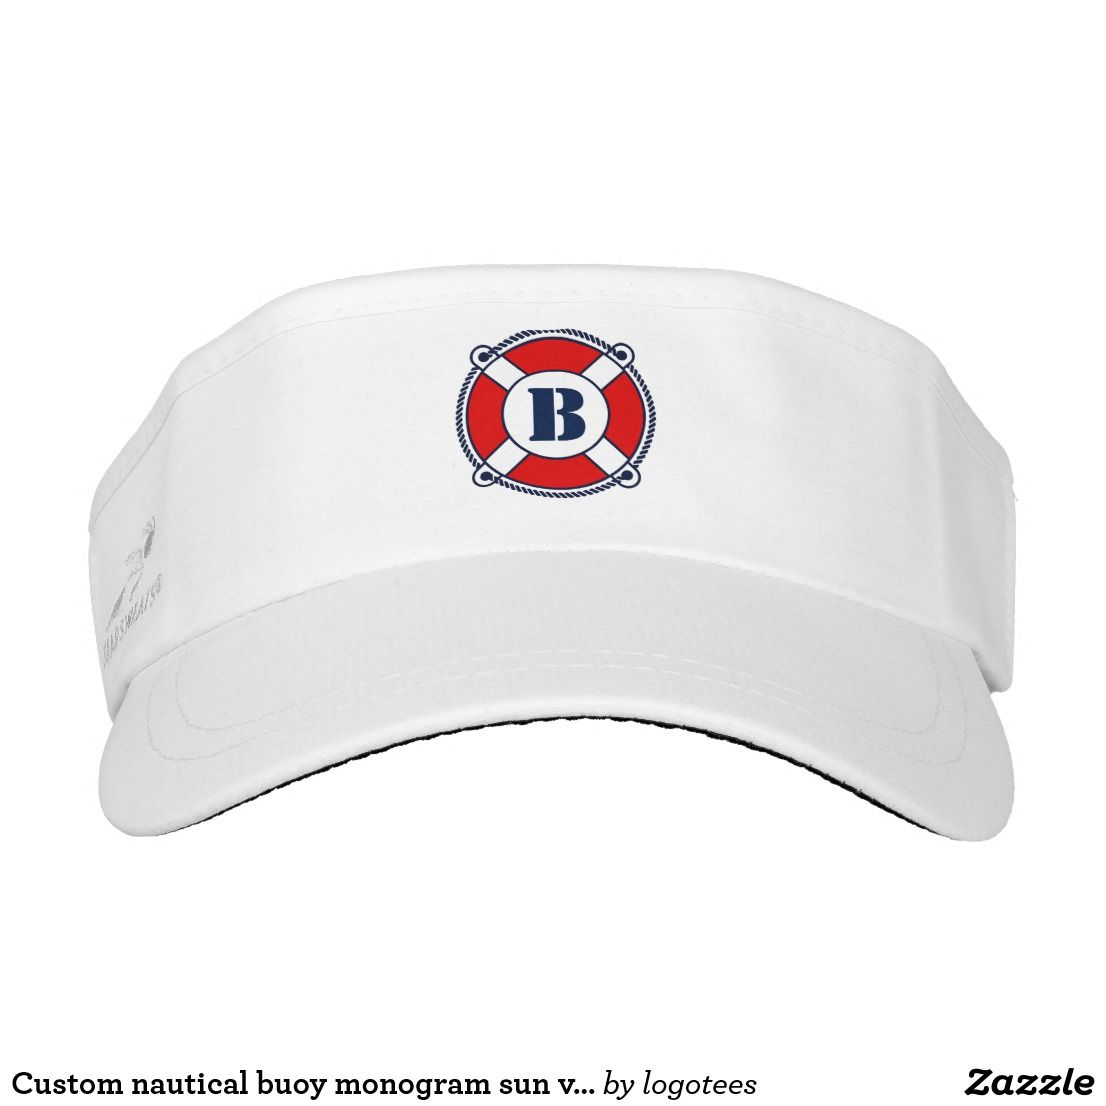 Custom nautical buoy monogram sun visor cap hat  e247f6116adc